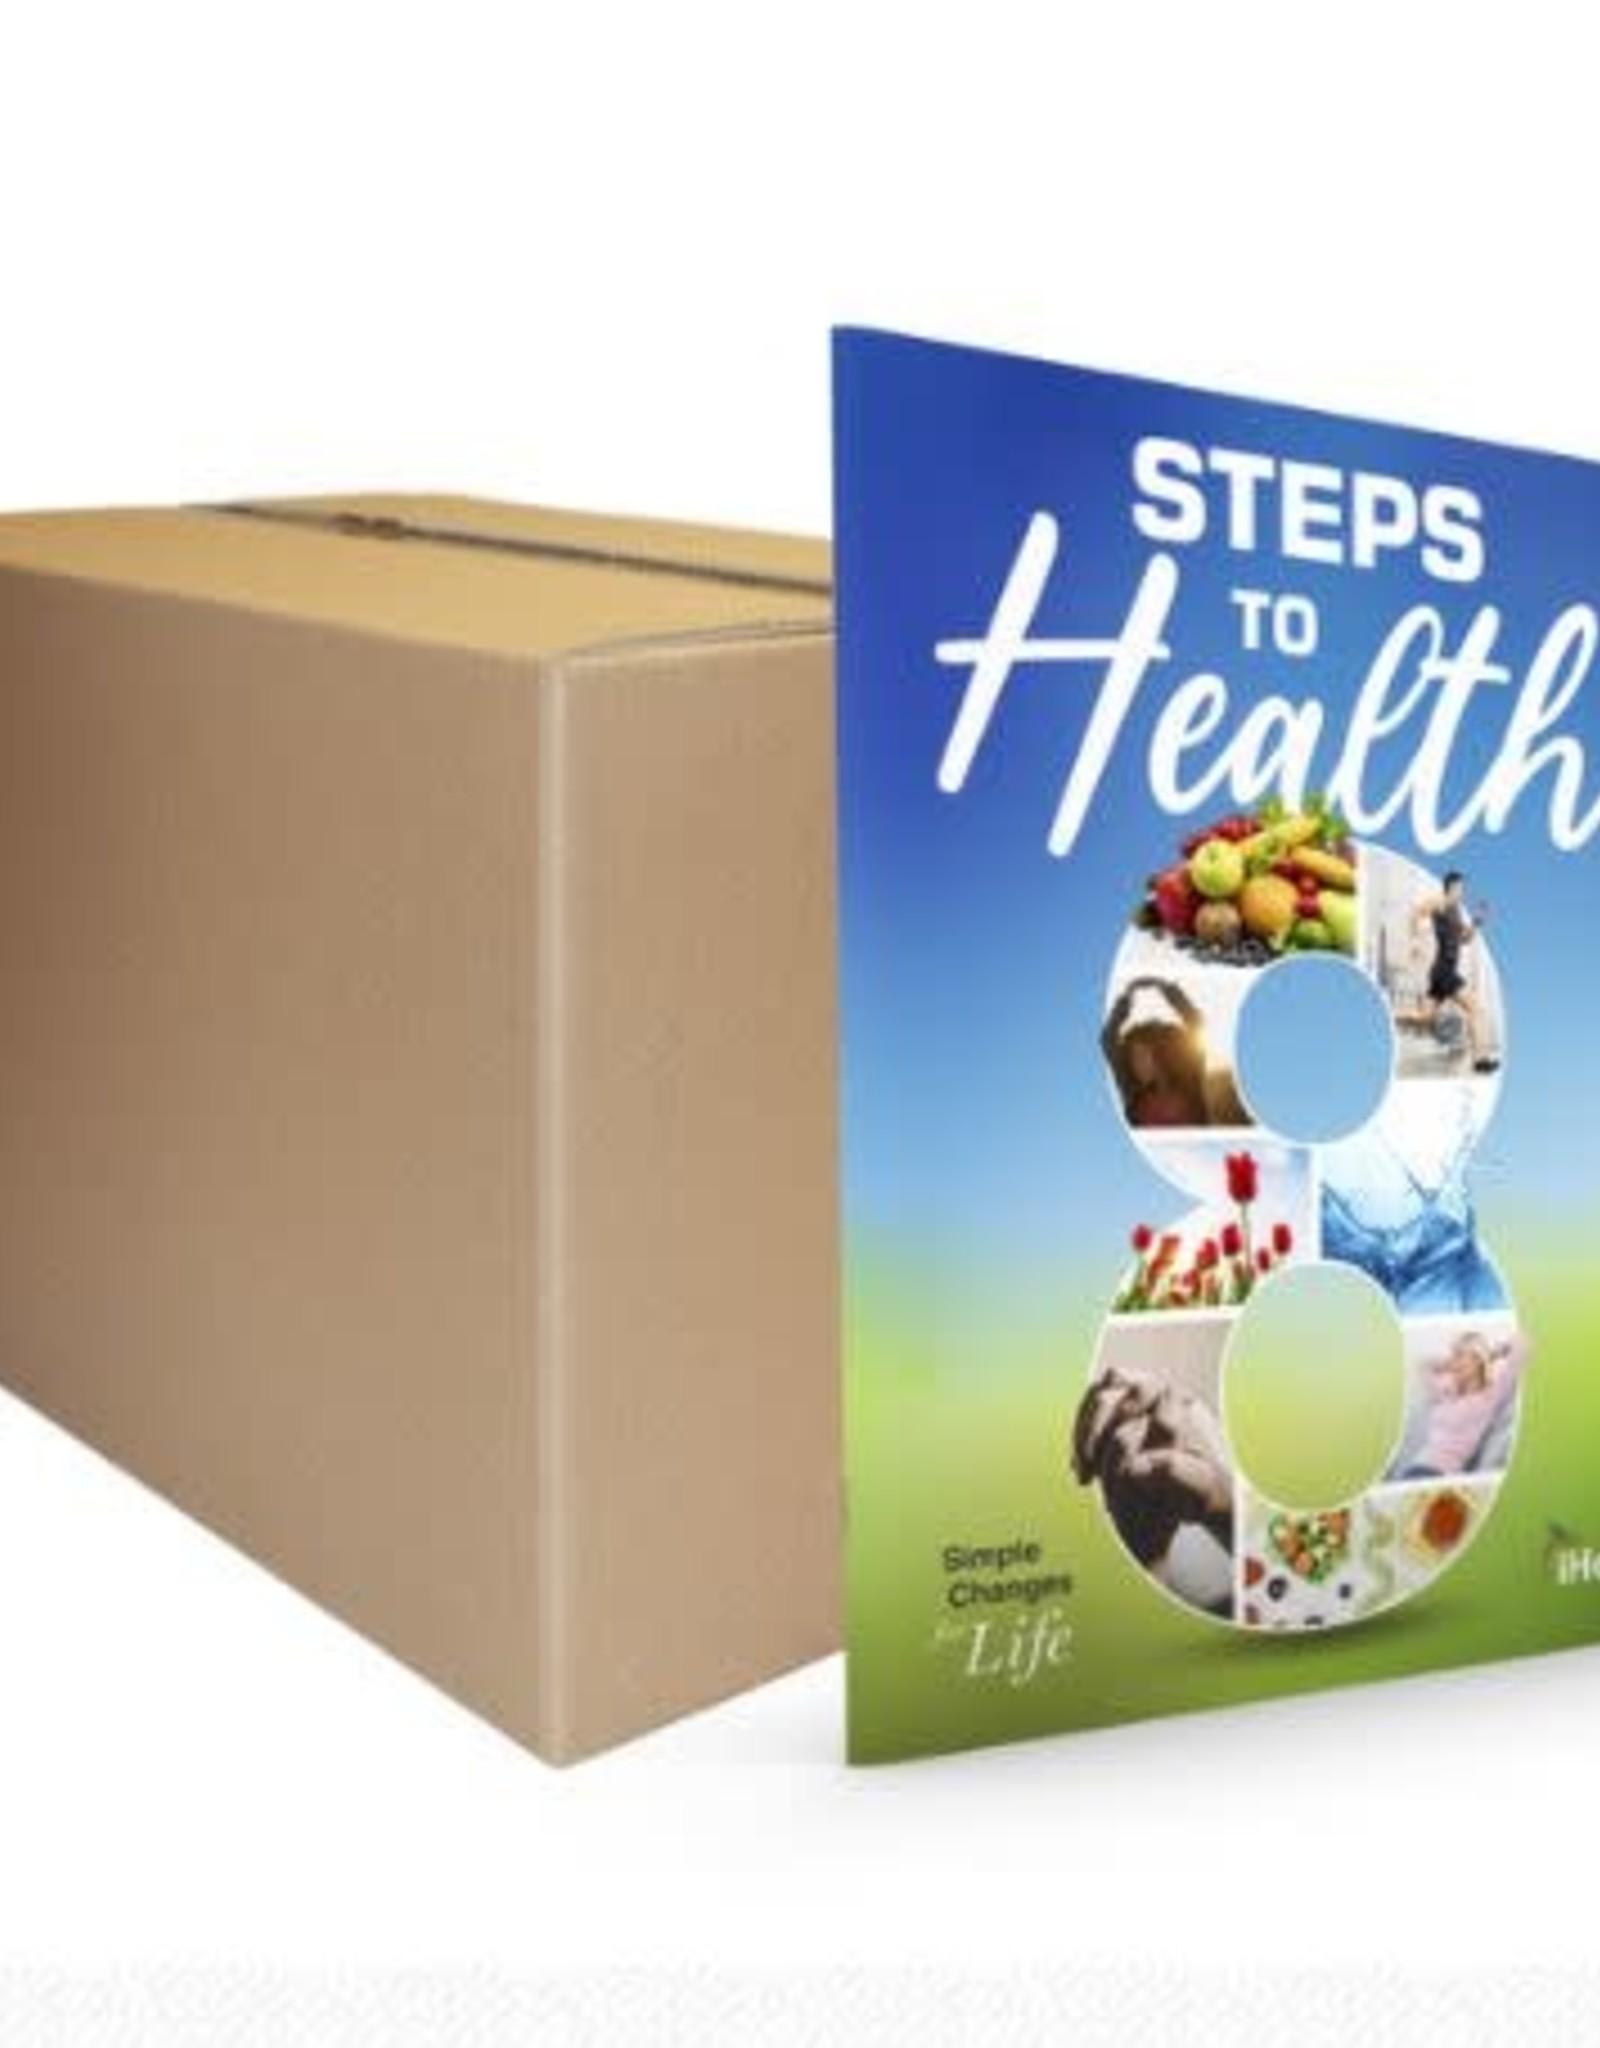 Glow Steps to Health Magazine - Box of 150 magazines